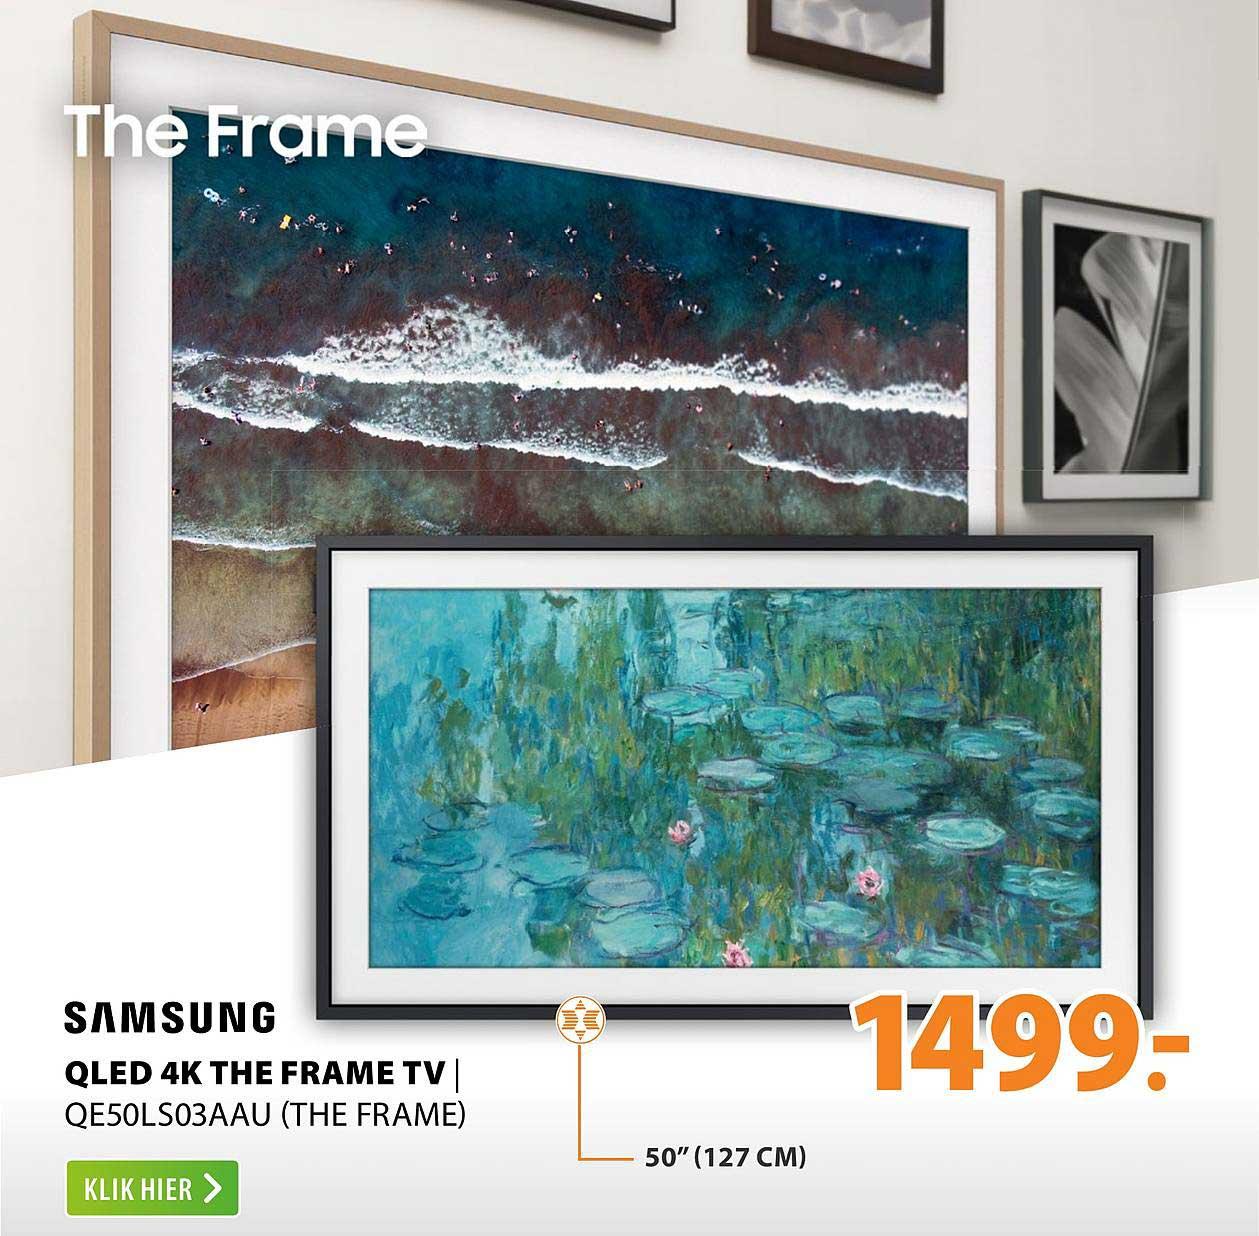 Expert Samsung QLED 4K The Frame TV | QE50LS03AAU (The Frame)